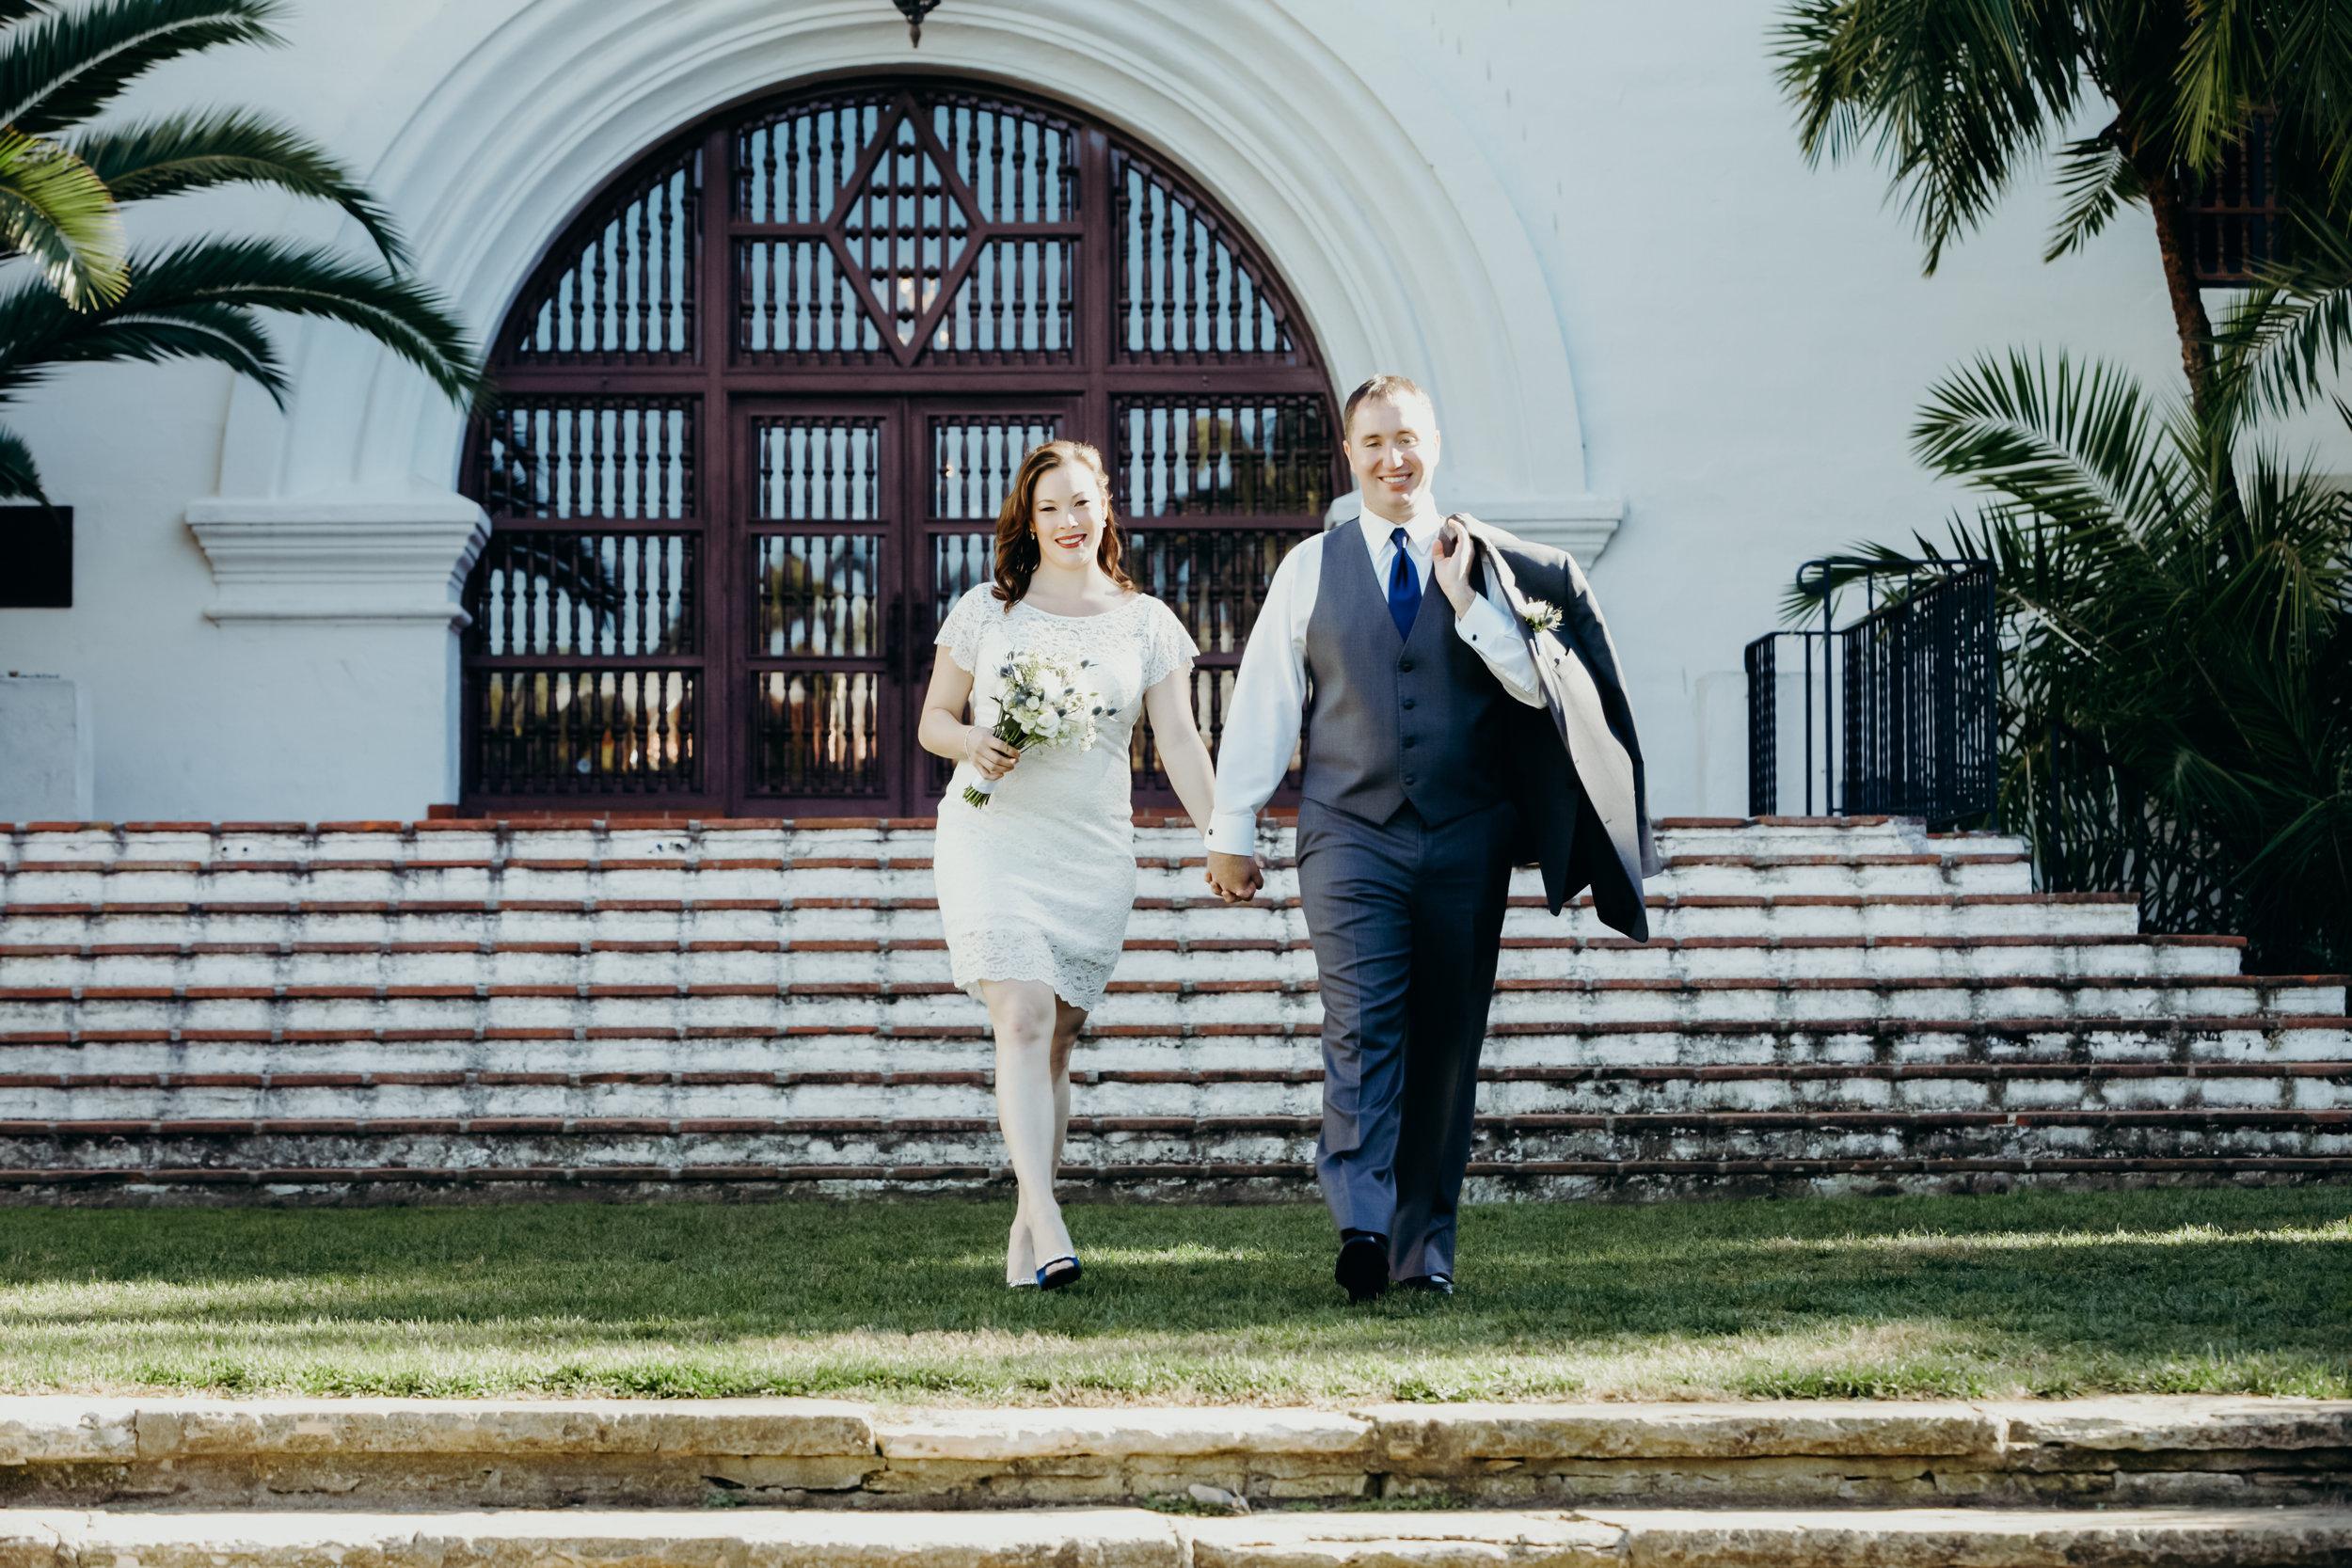 Gianna Keiko Atlanta Destination Wedding Elopement Photographer-25.jpg